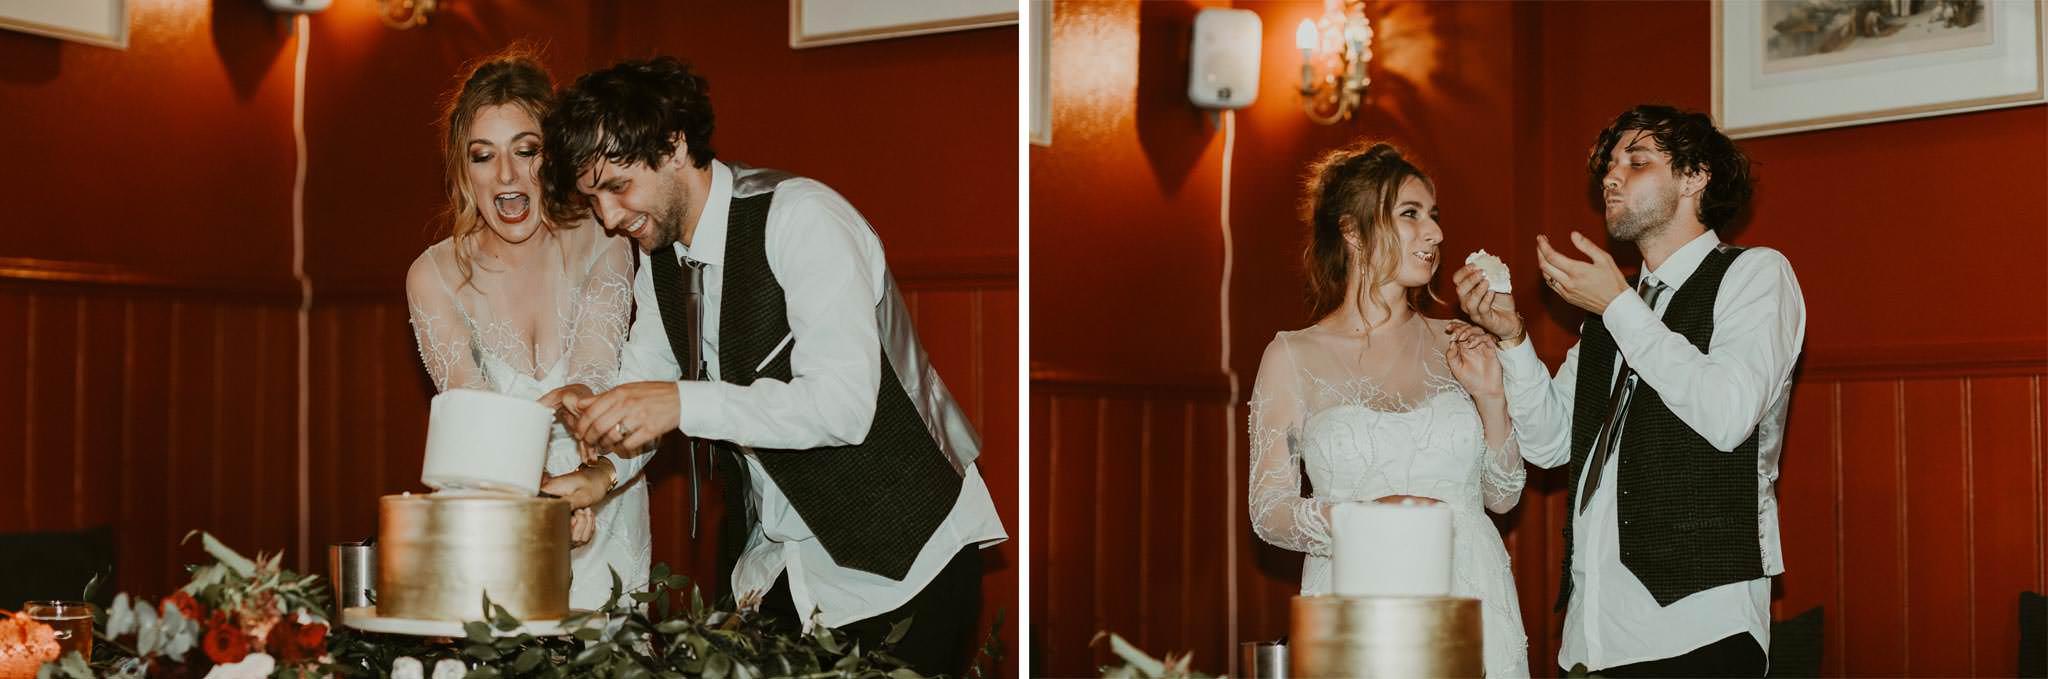 destination-wedding-photographer-198